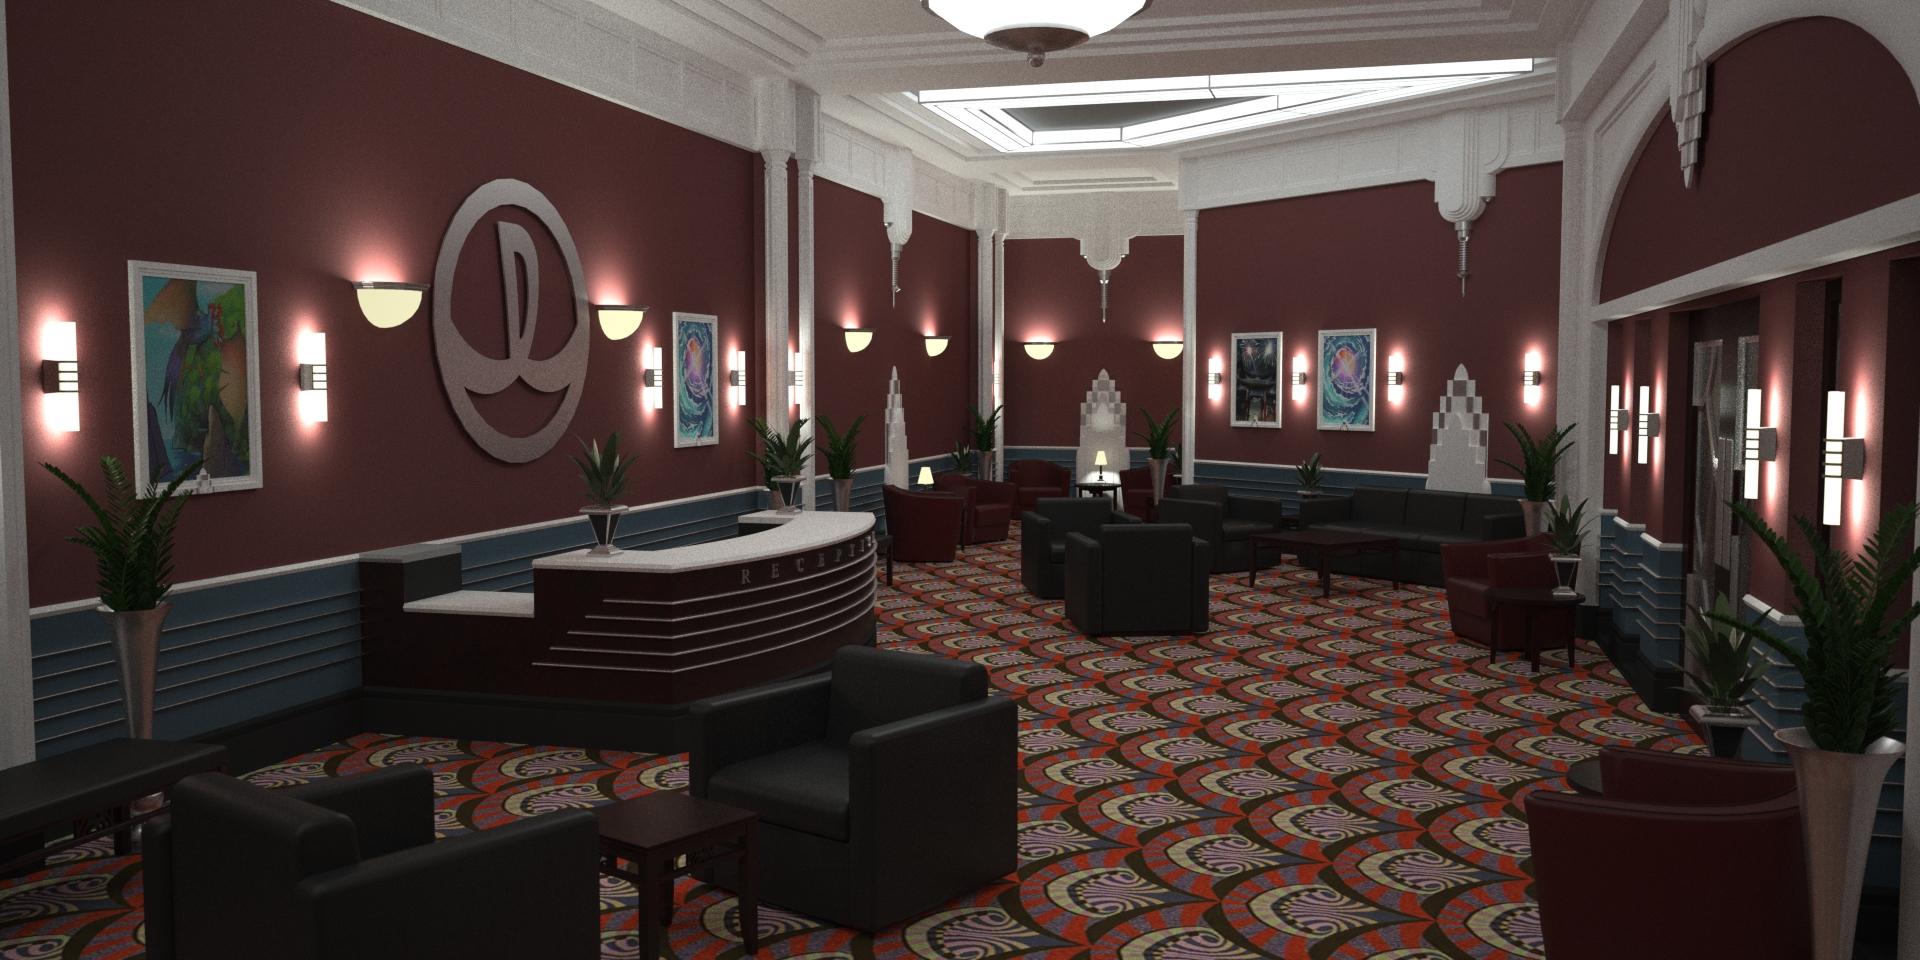 WANDA-Qingdao VIP Lounge V1_3 View 03 (MAXWELL).jpg